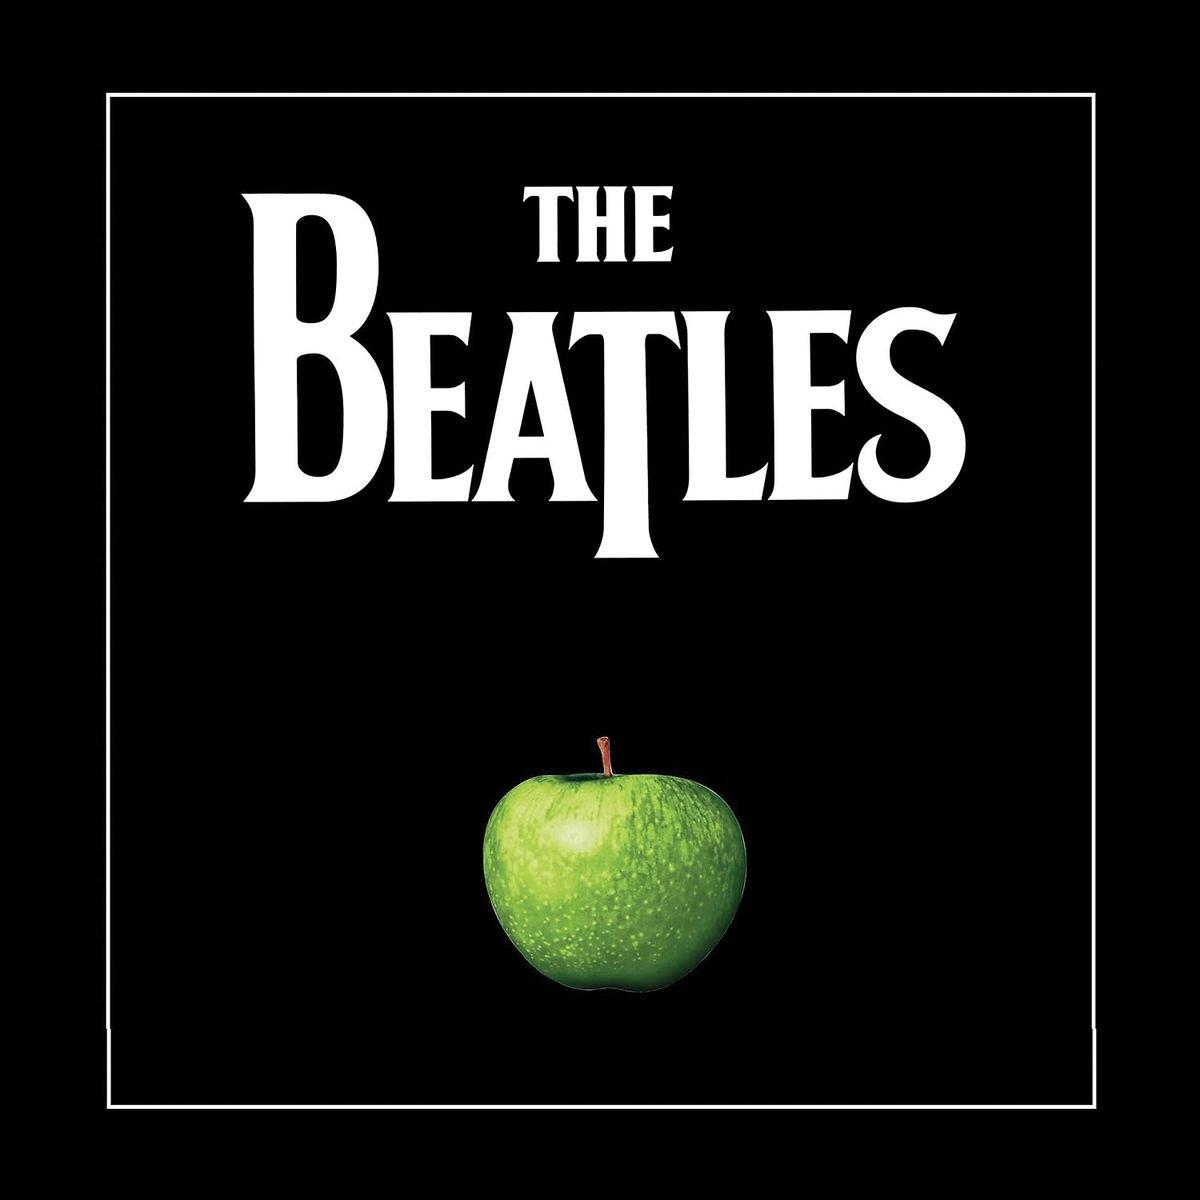 The Beatles Original Studio Recordings Stereo Brush Real Techniques Ori Usa Import Box Set Music